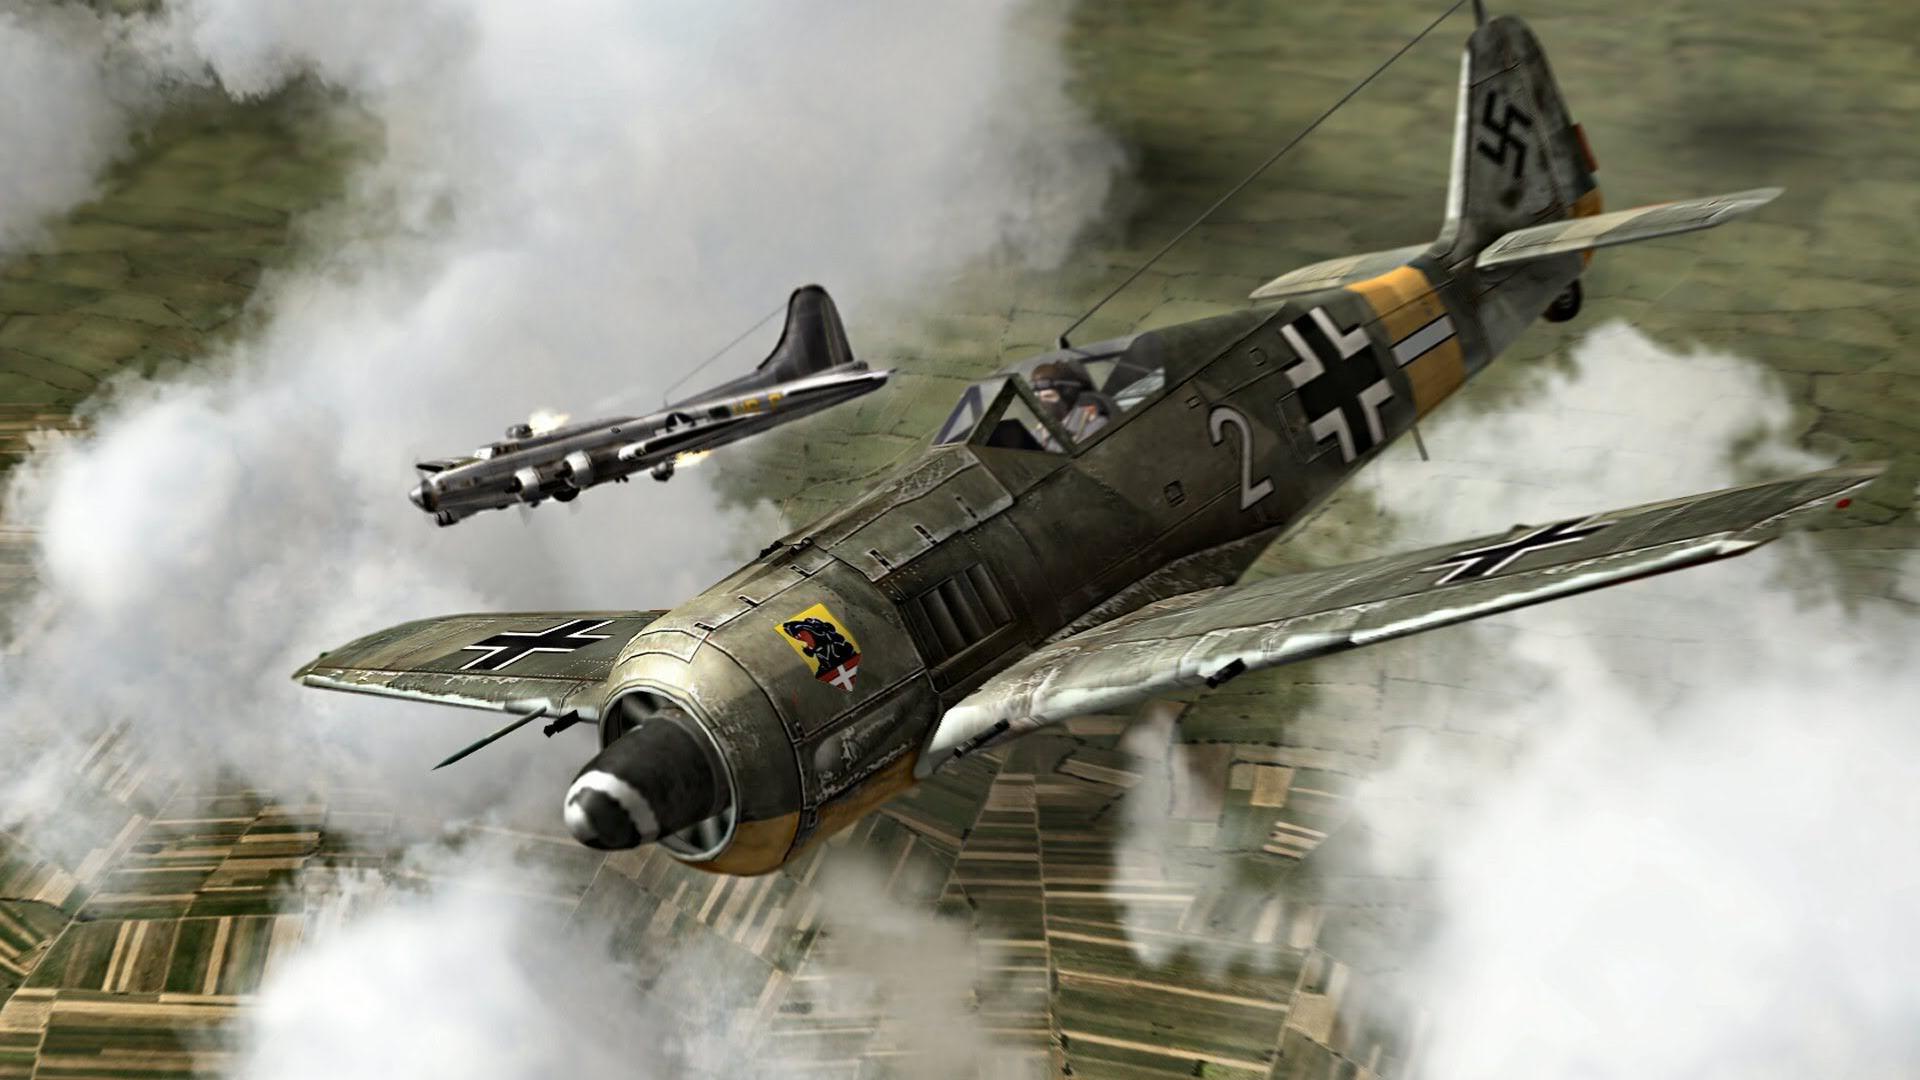 Wunderwaffen: i prototipi Focke-Wulf